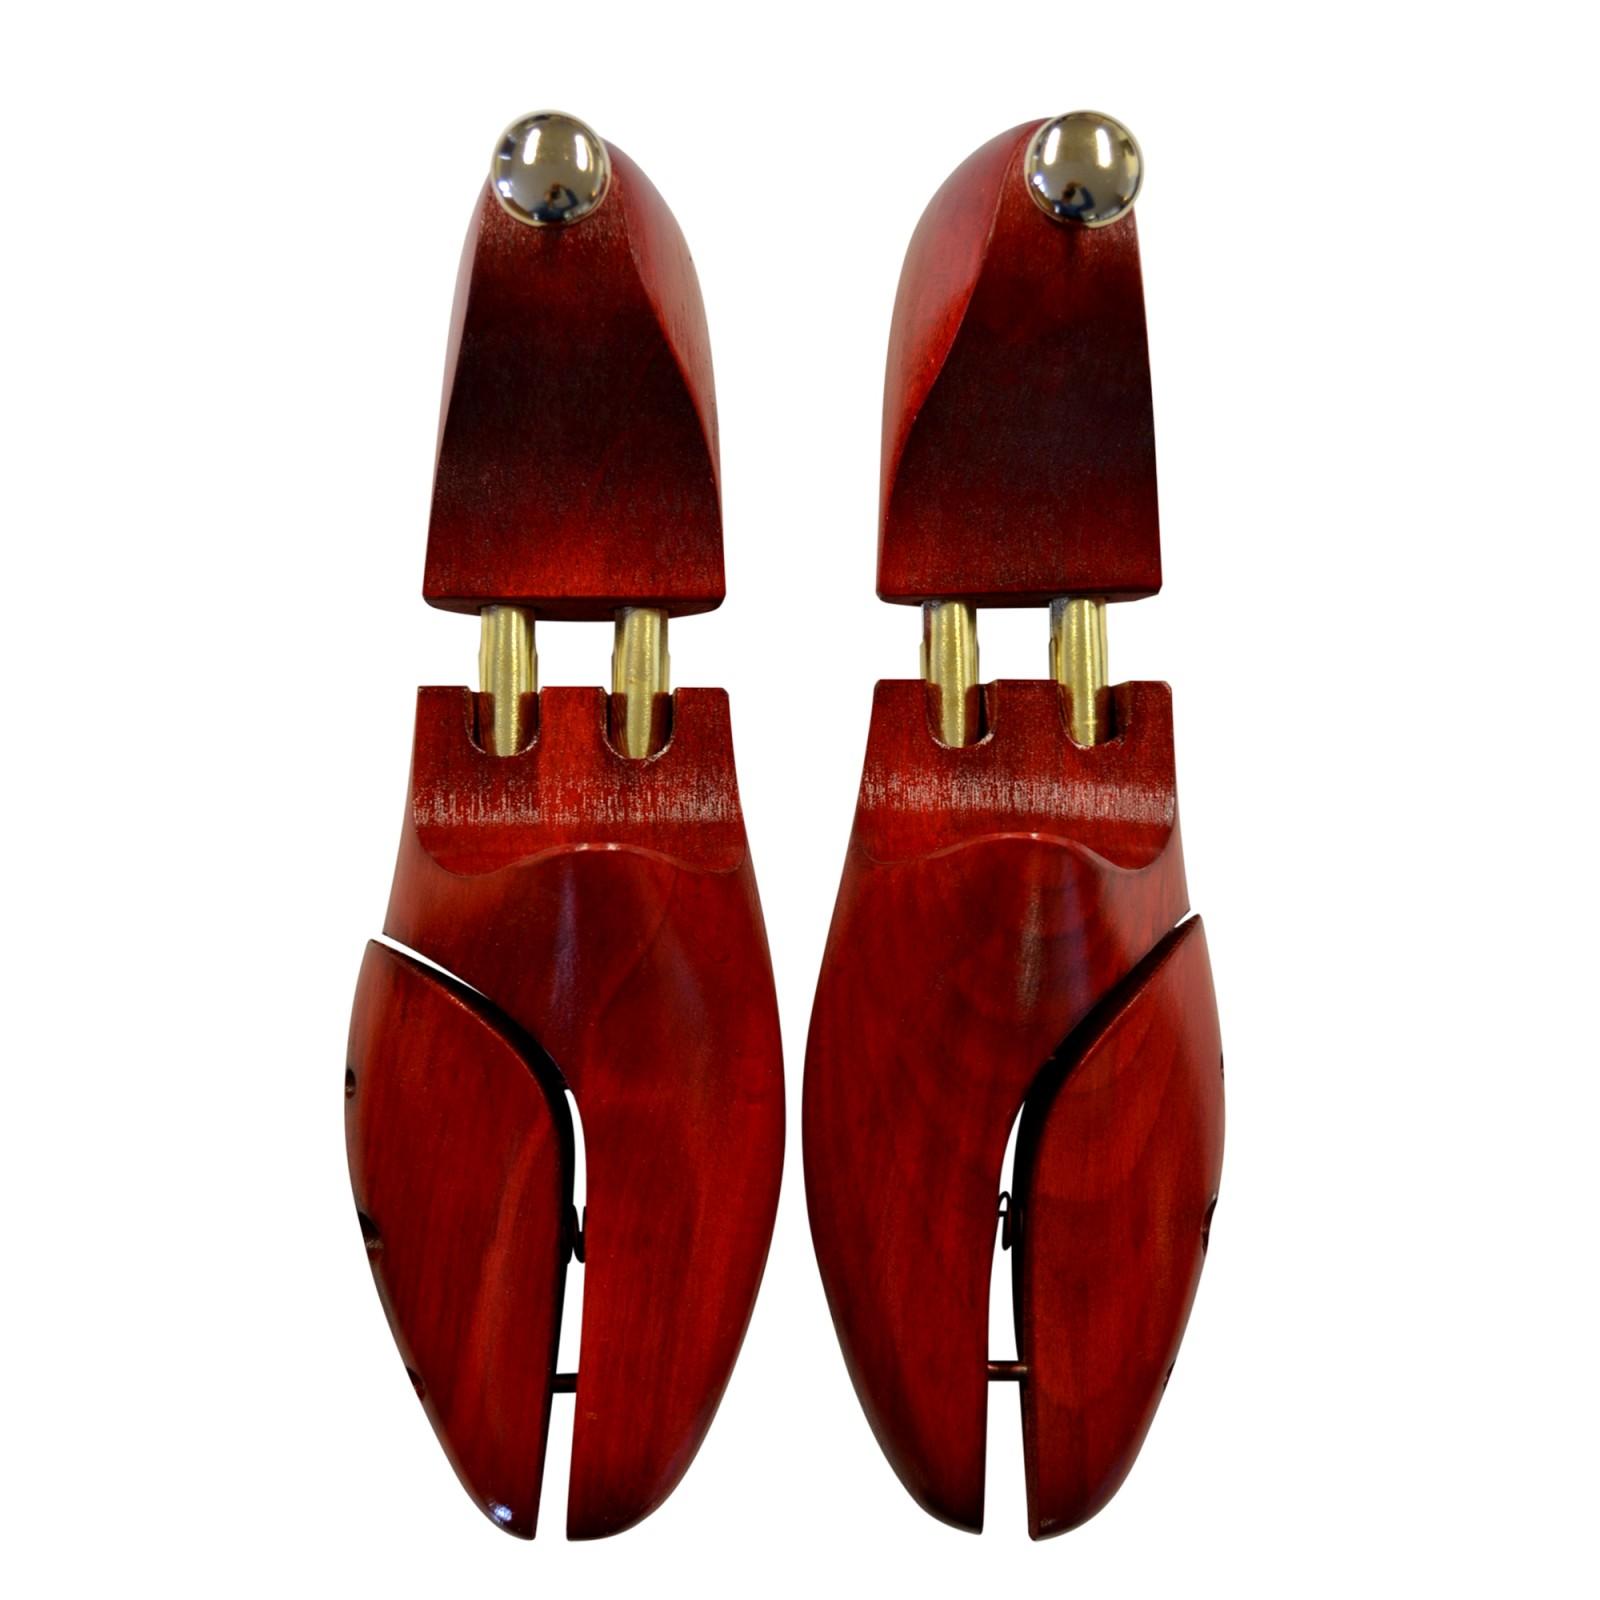 Shoe String Deluxe Red Beechwood Shoe Trees